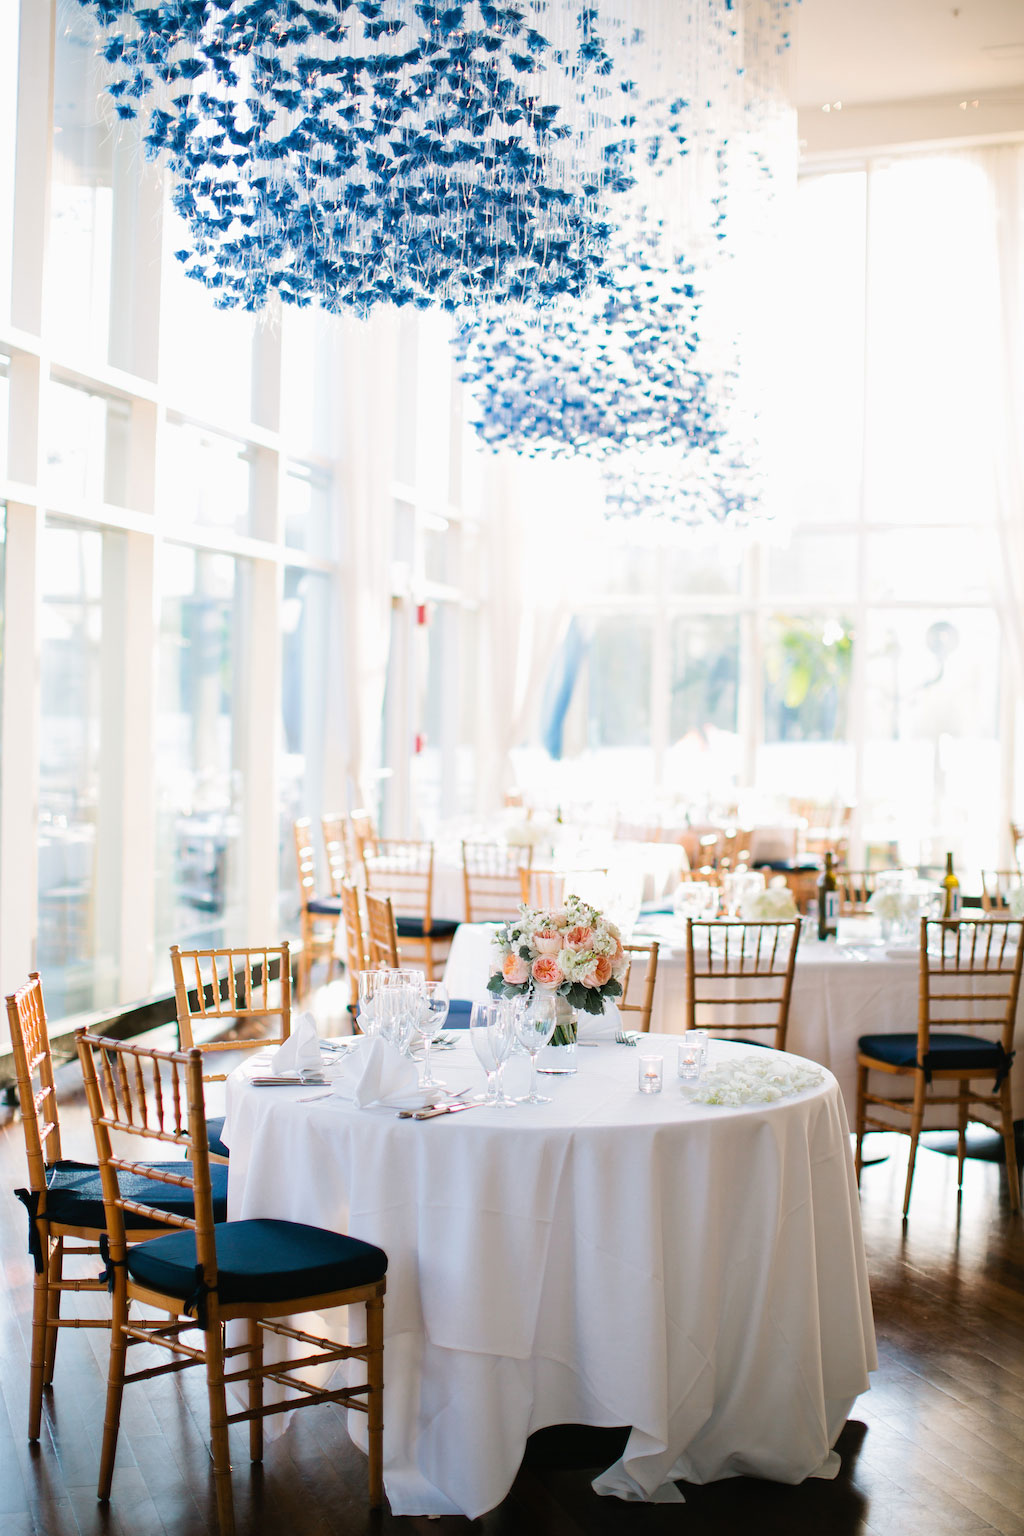 8-16-16-last-minute-wedding-venues1